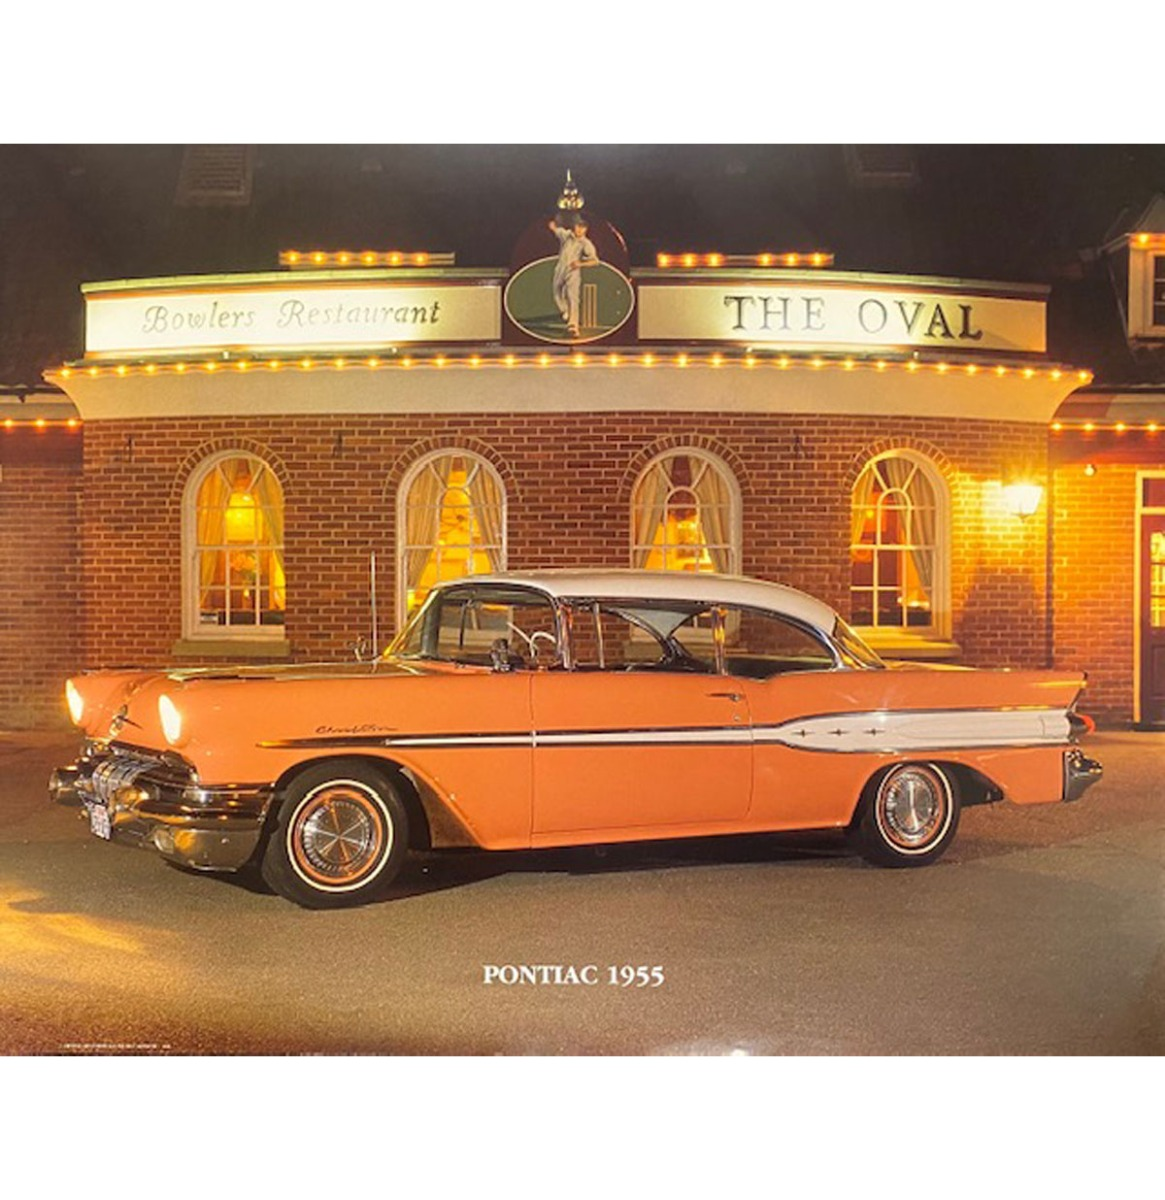 Auto Poster Pontiac 1955 40x50 cm